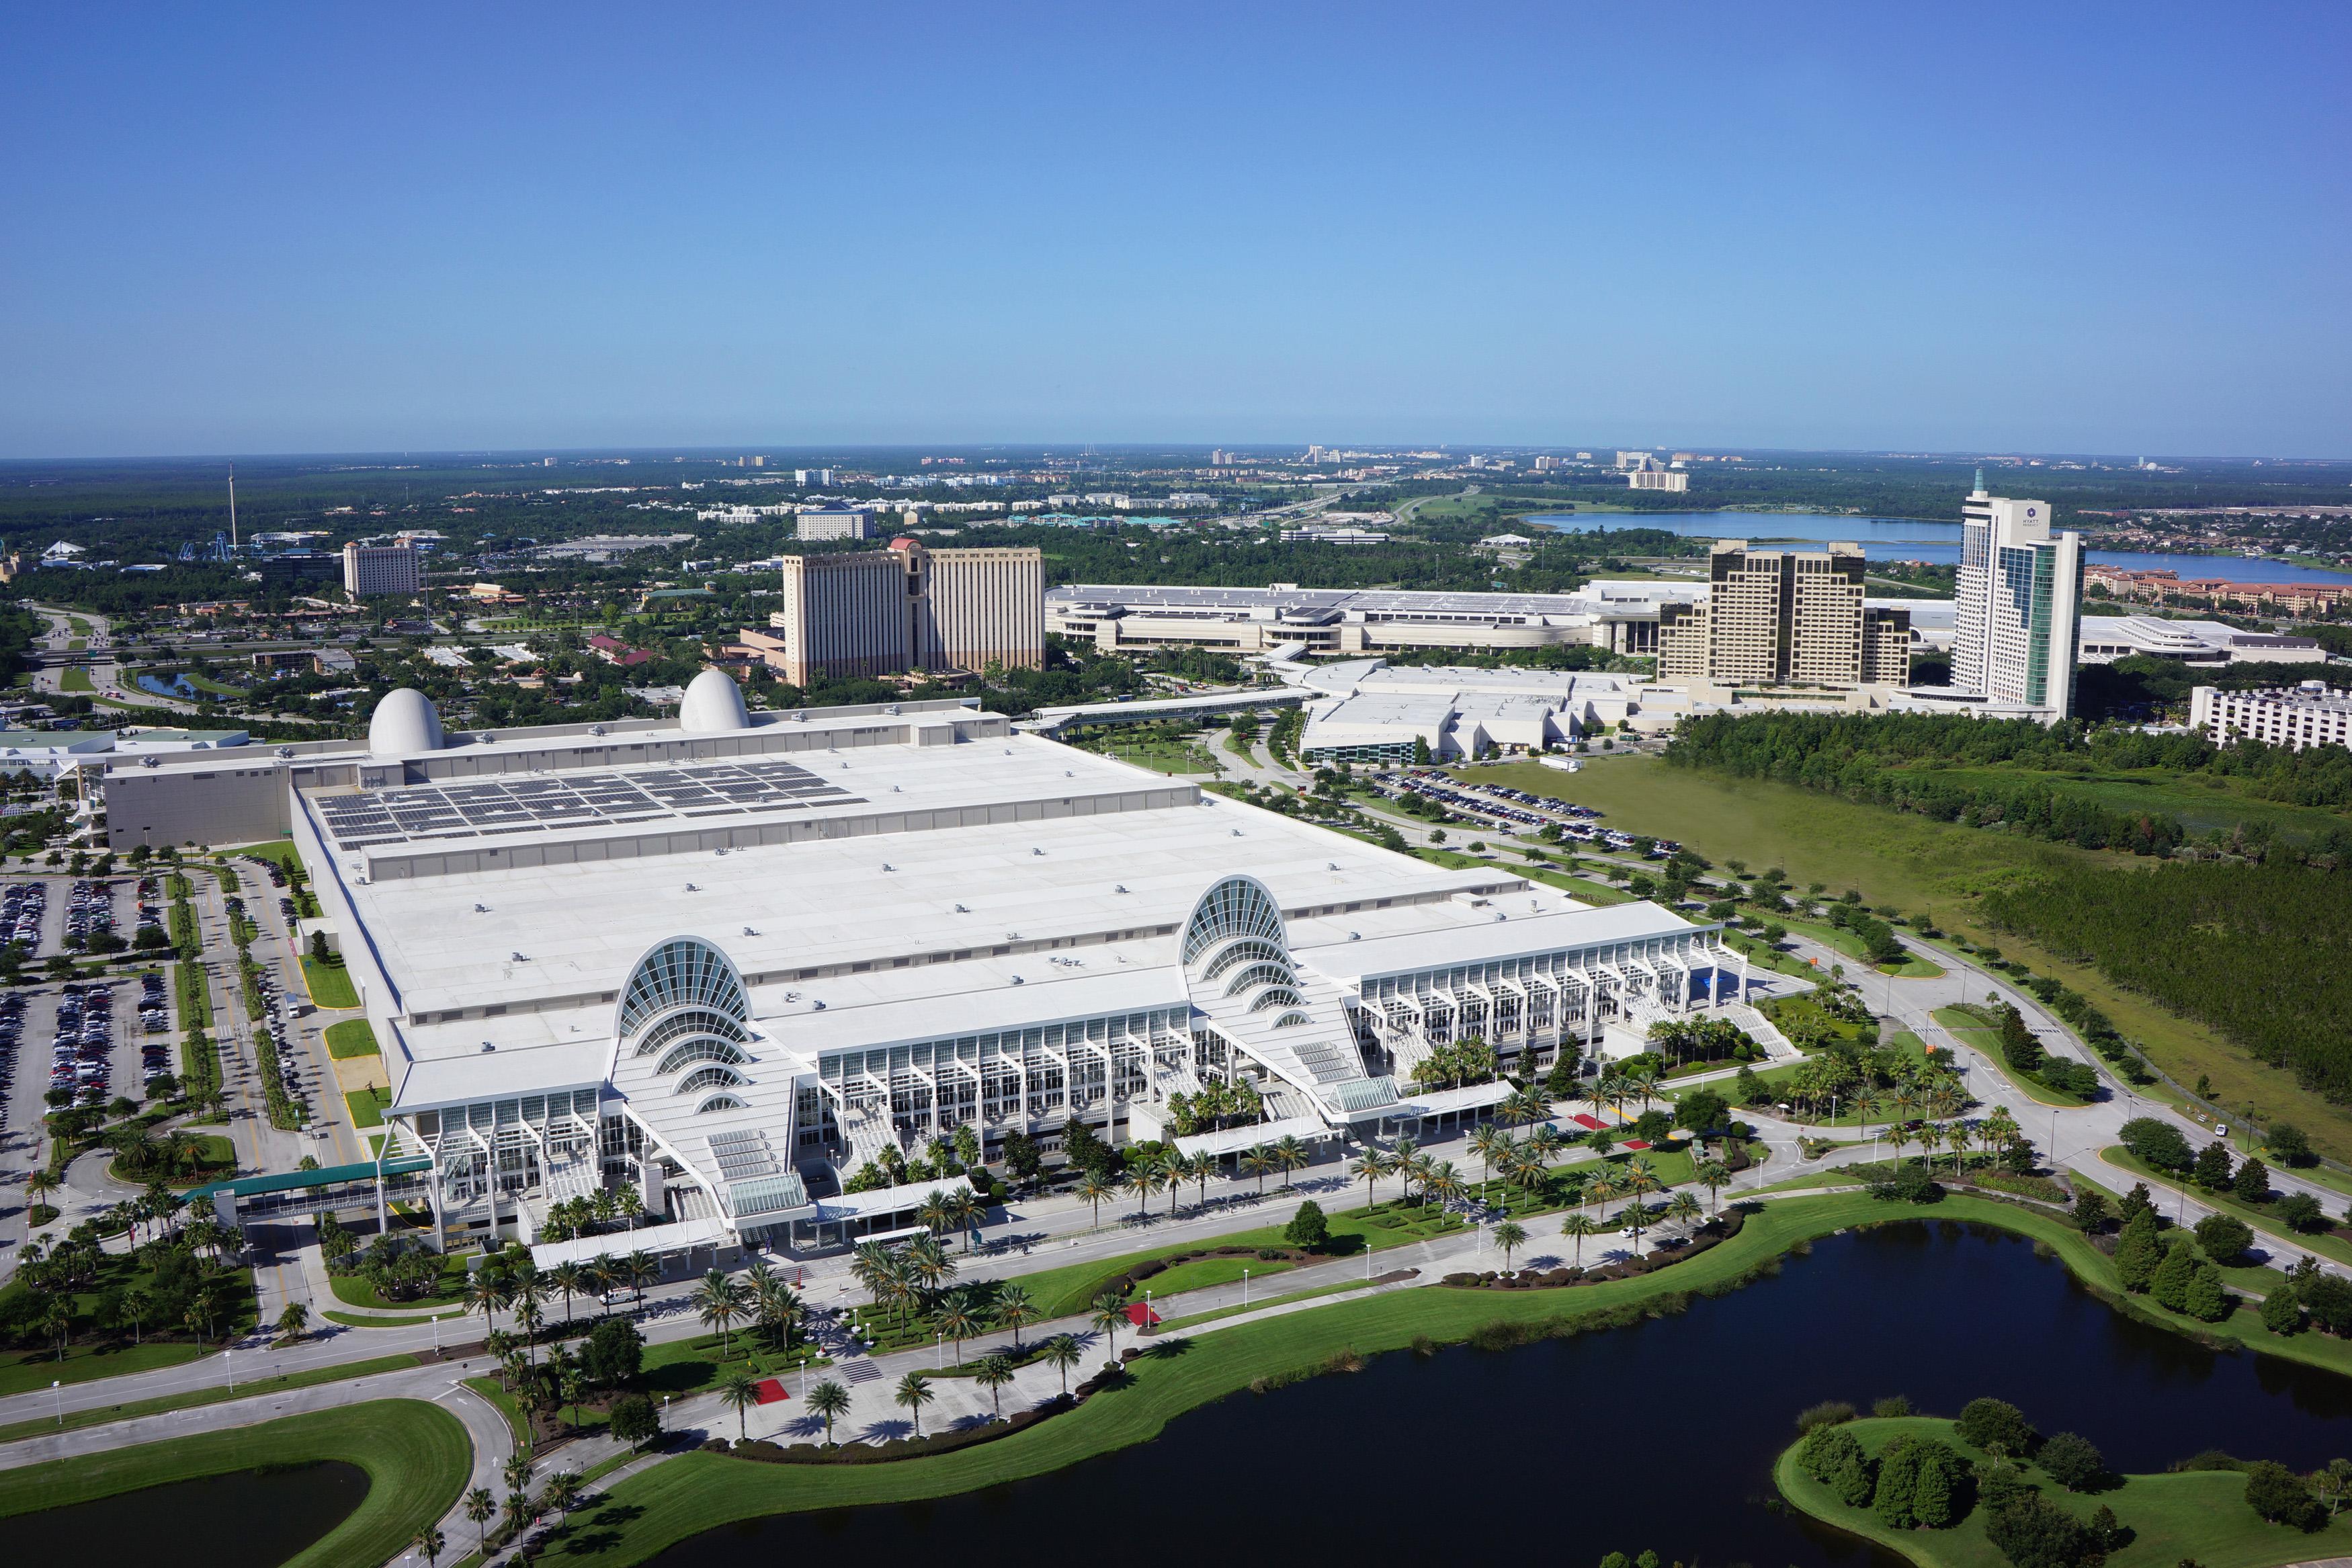 Occc Celebrates 35Th Anniversary - Blog   Orange County Inside Orlando Convention Center Schedule